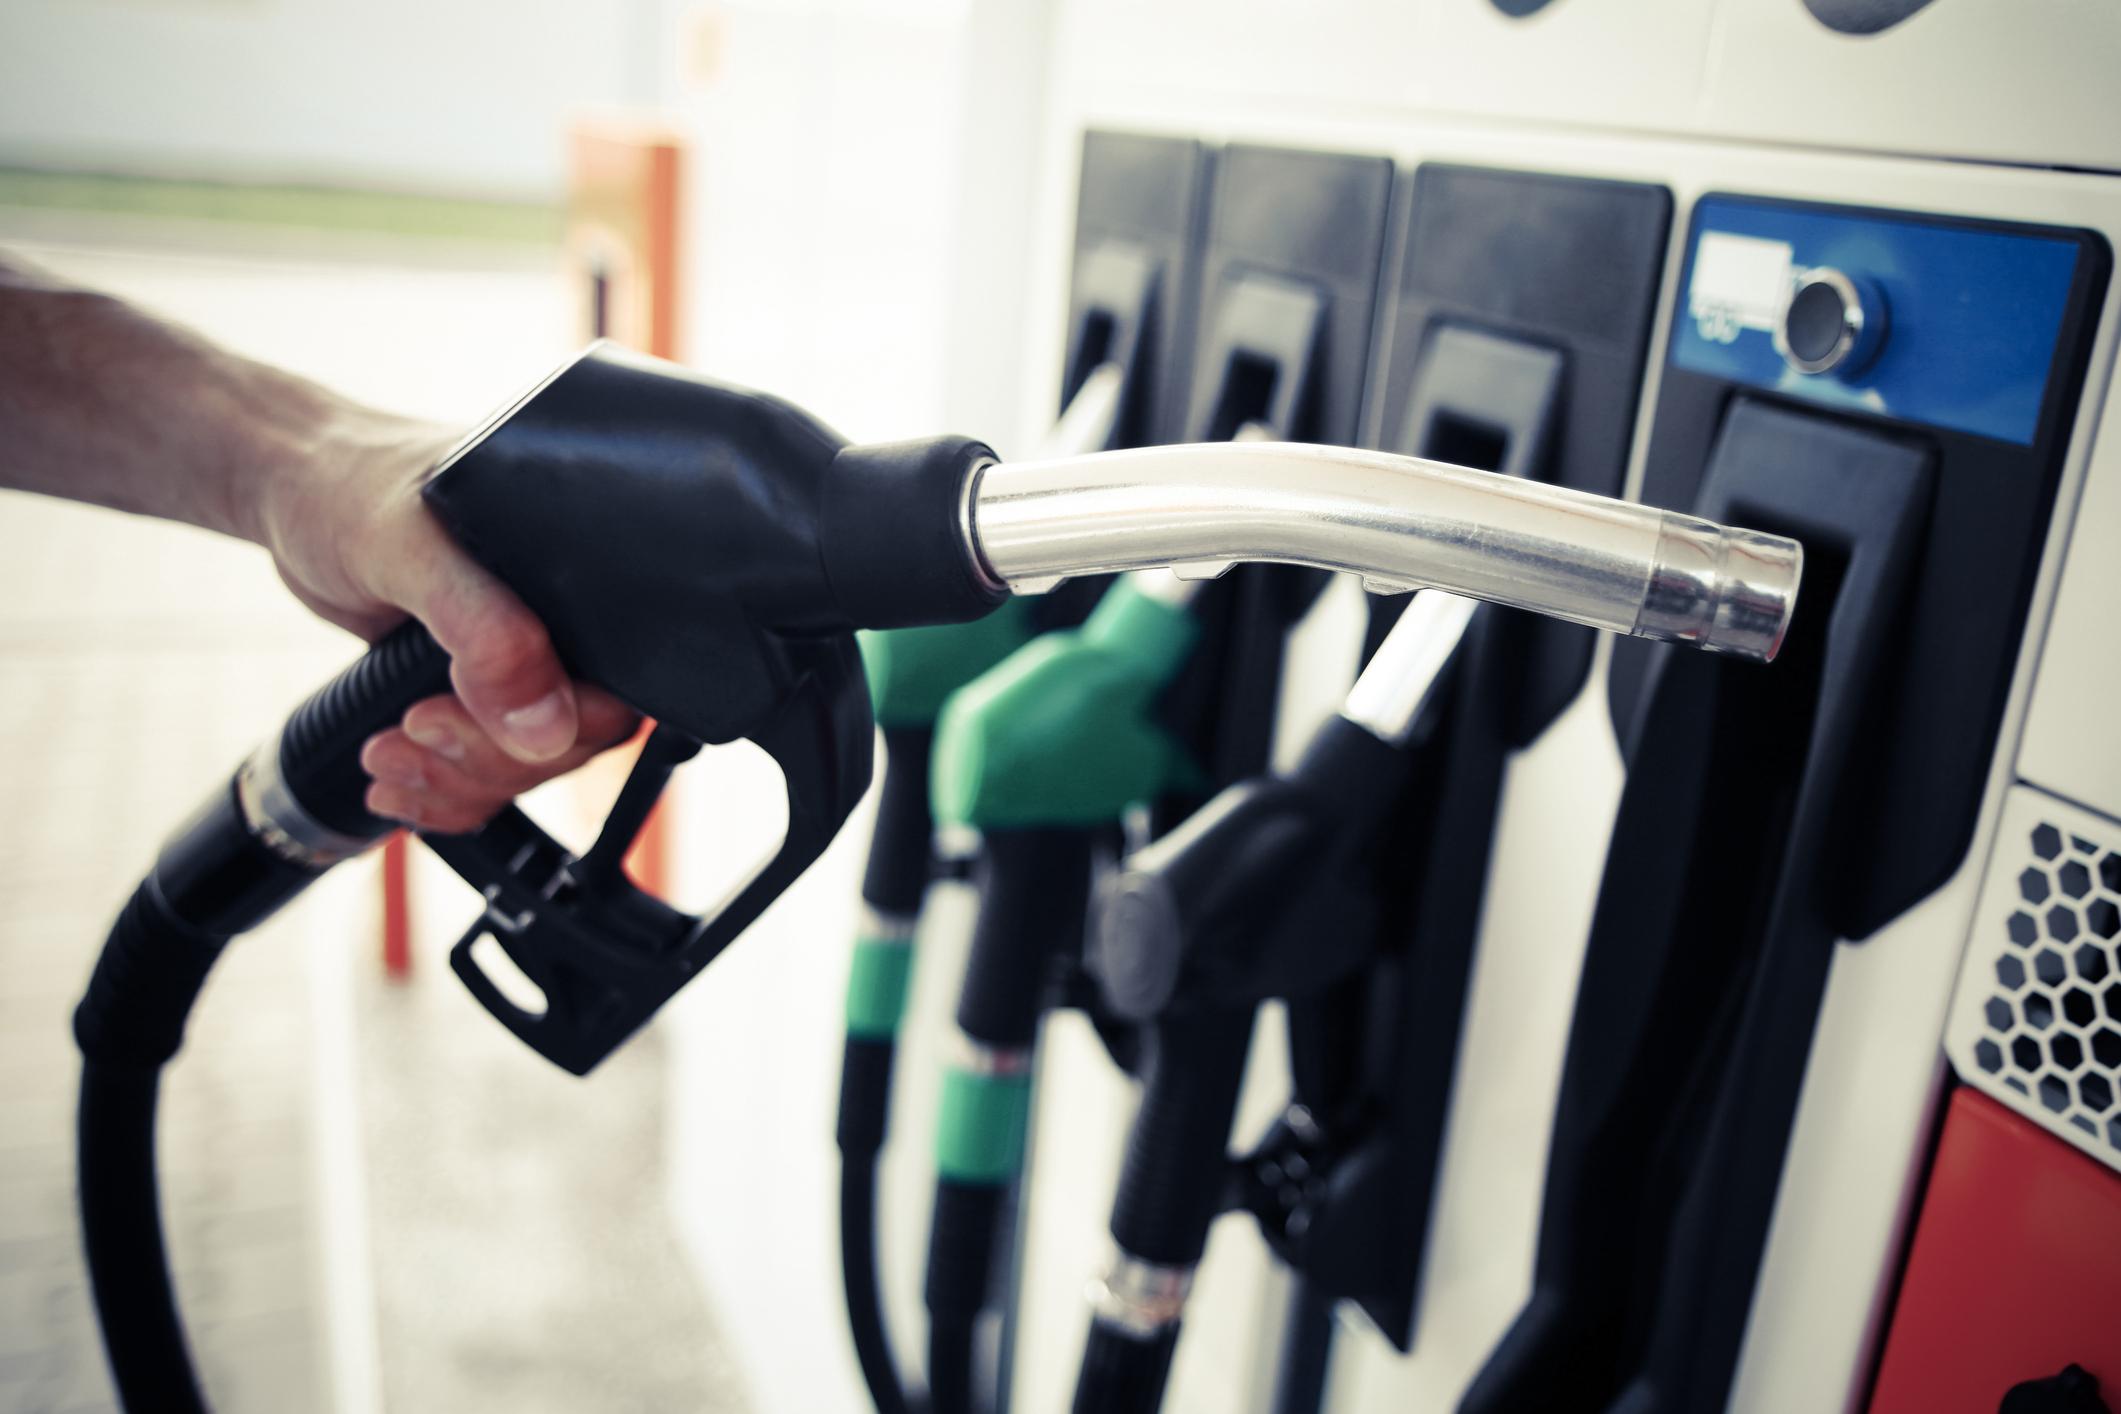 A hand holding a gas pump hose